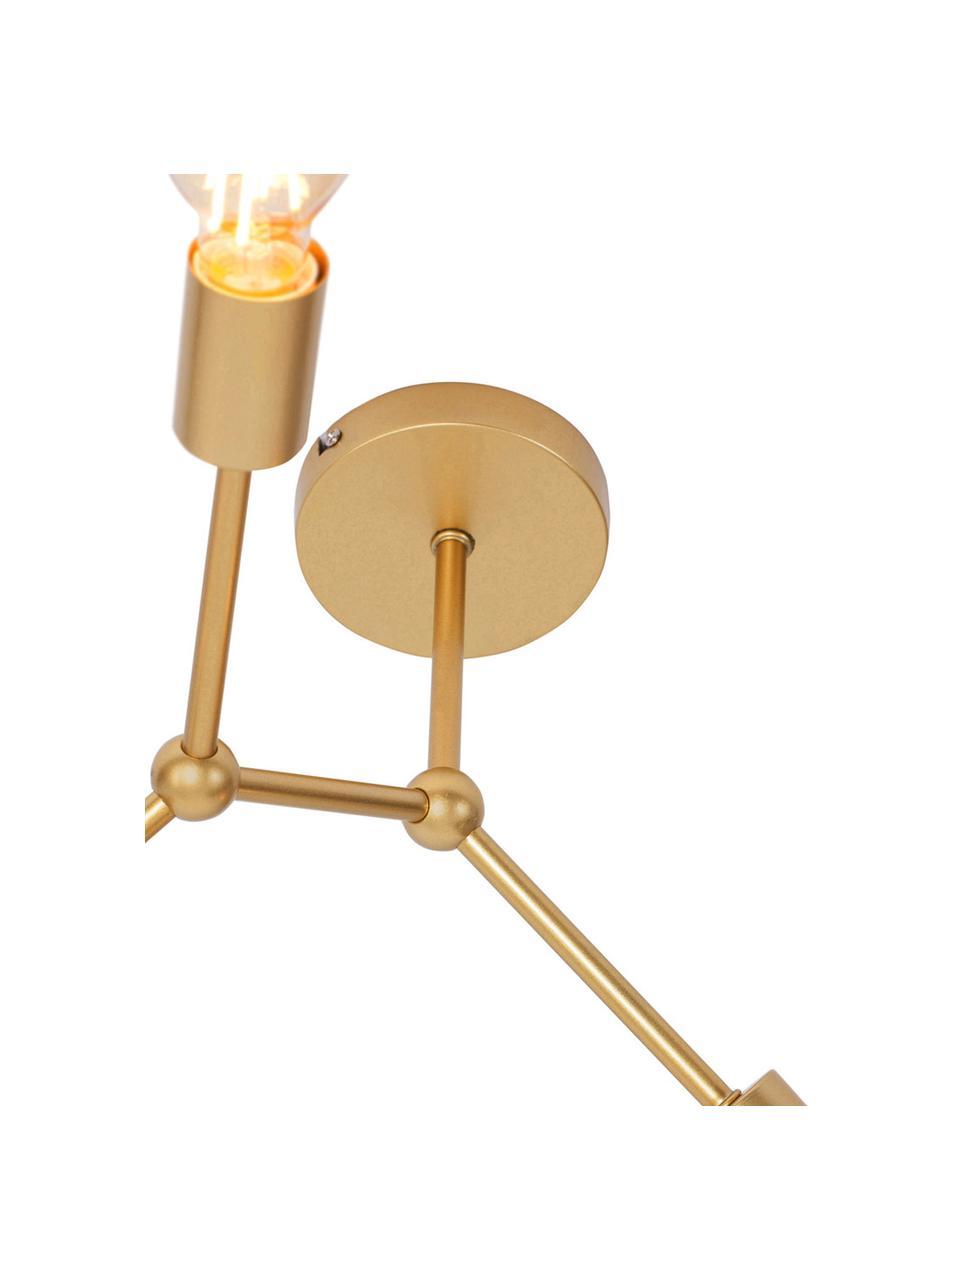 Deckenleuchte Ilias in Gold, Baldachin: Aluminium, beschichtet, Messingfarben, Ø 45 x H 45 cm